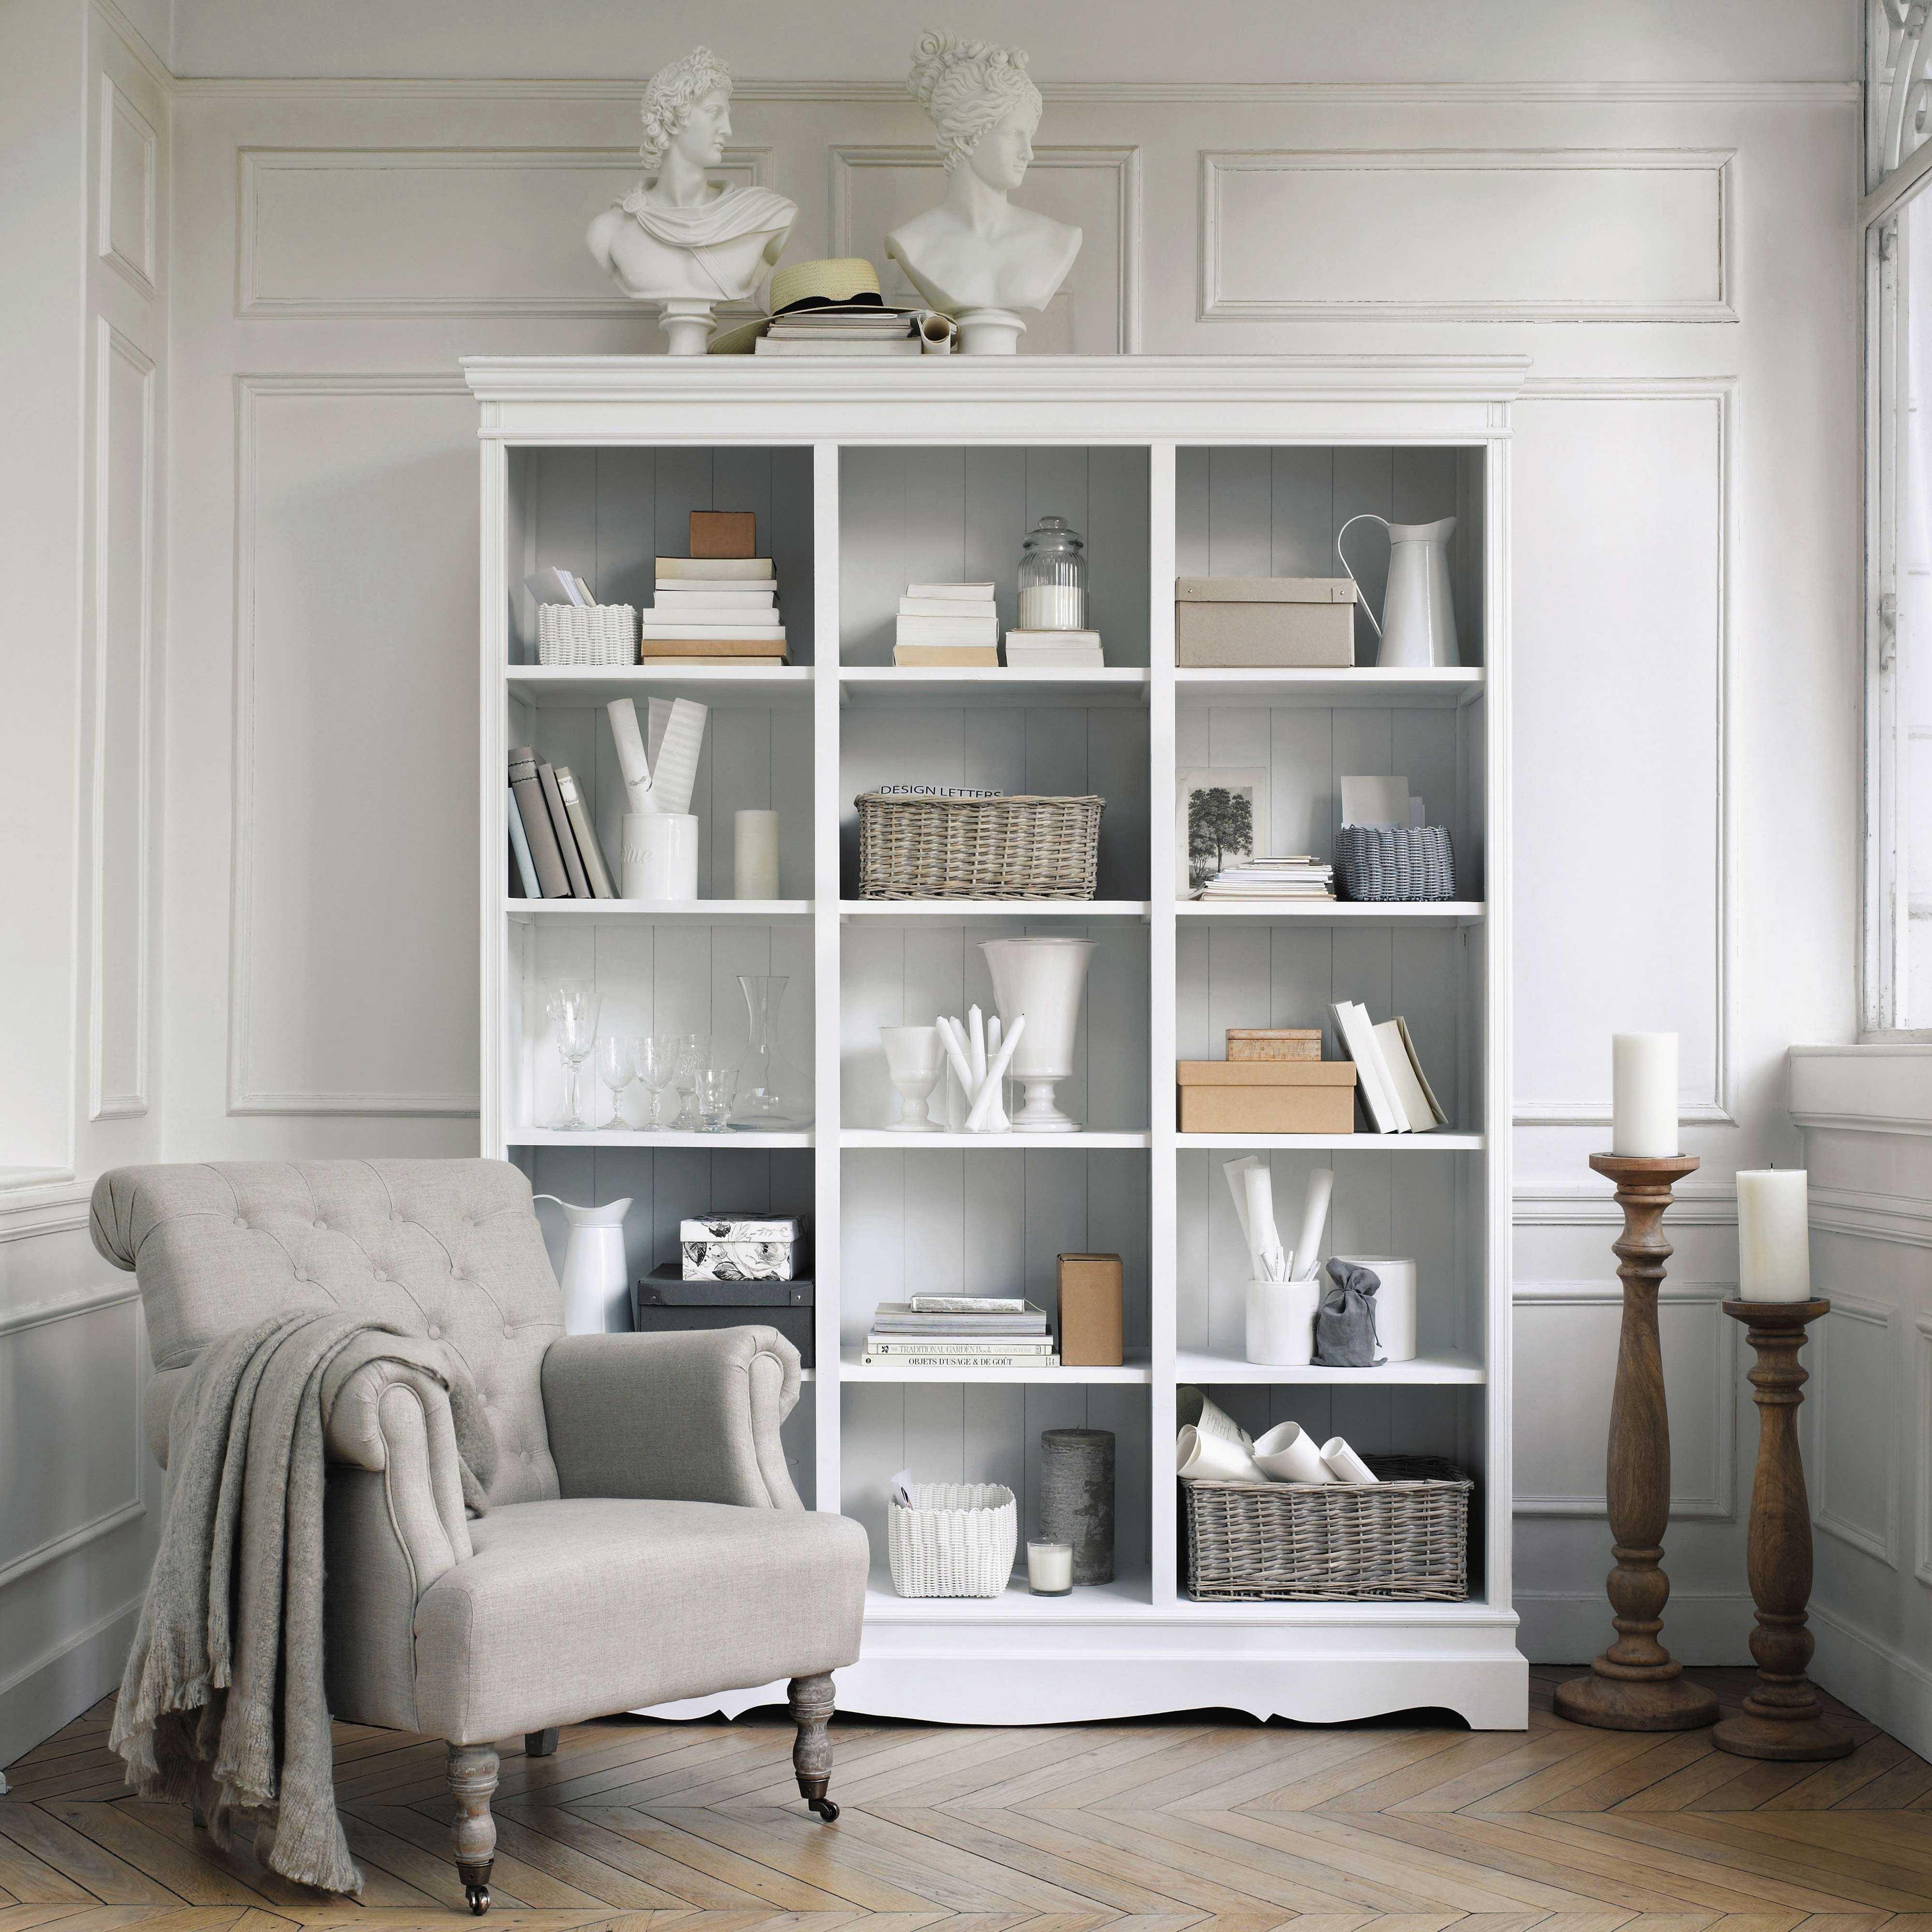 Librer a de paulonia blanca biblioteca sillones para - Librerias salon blancas ...